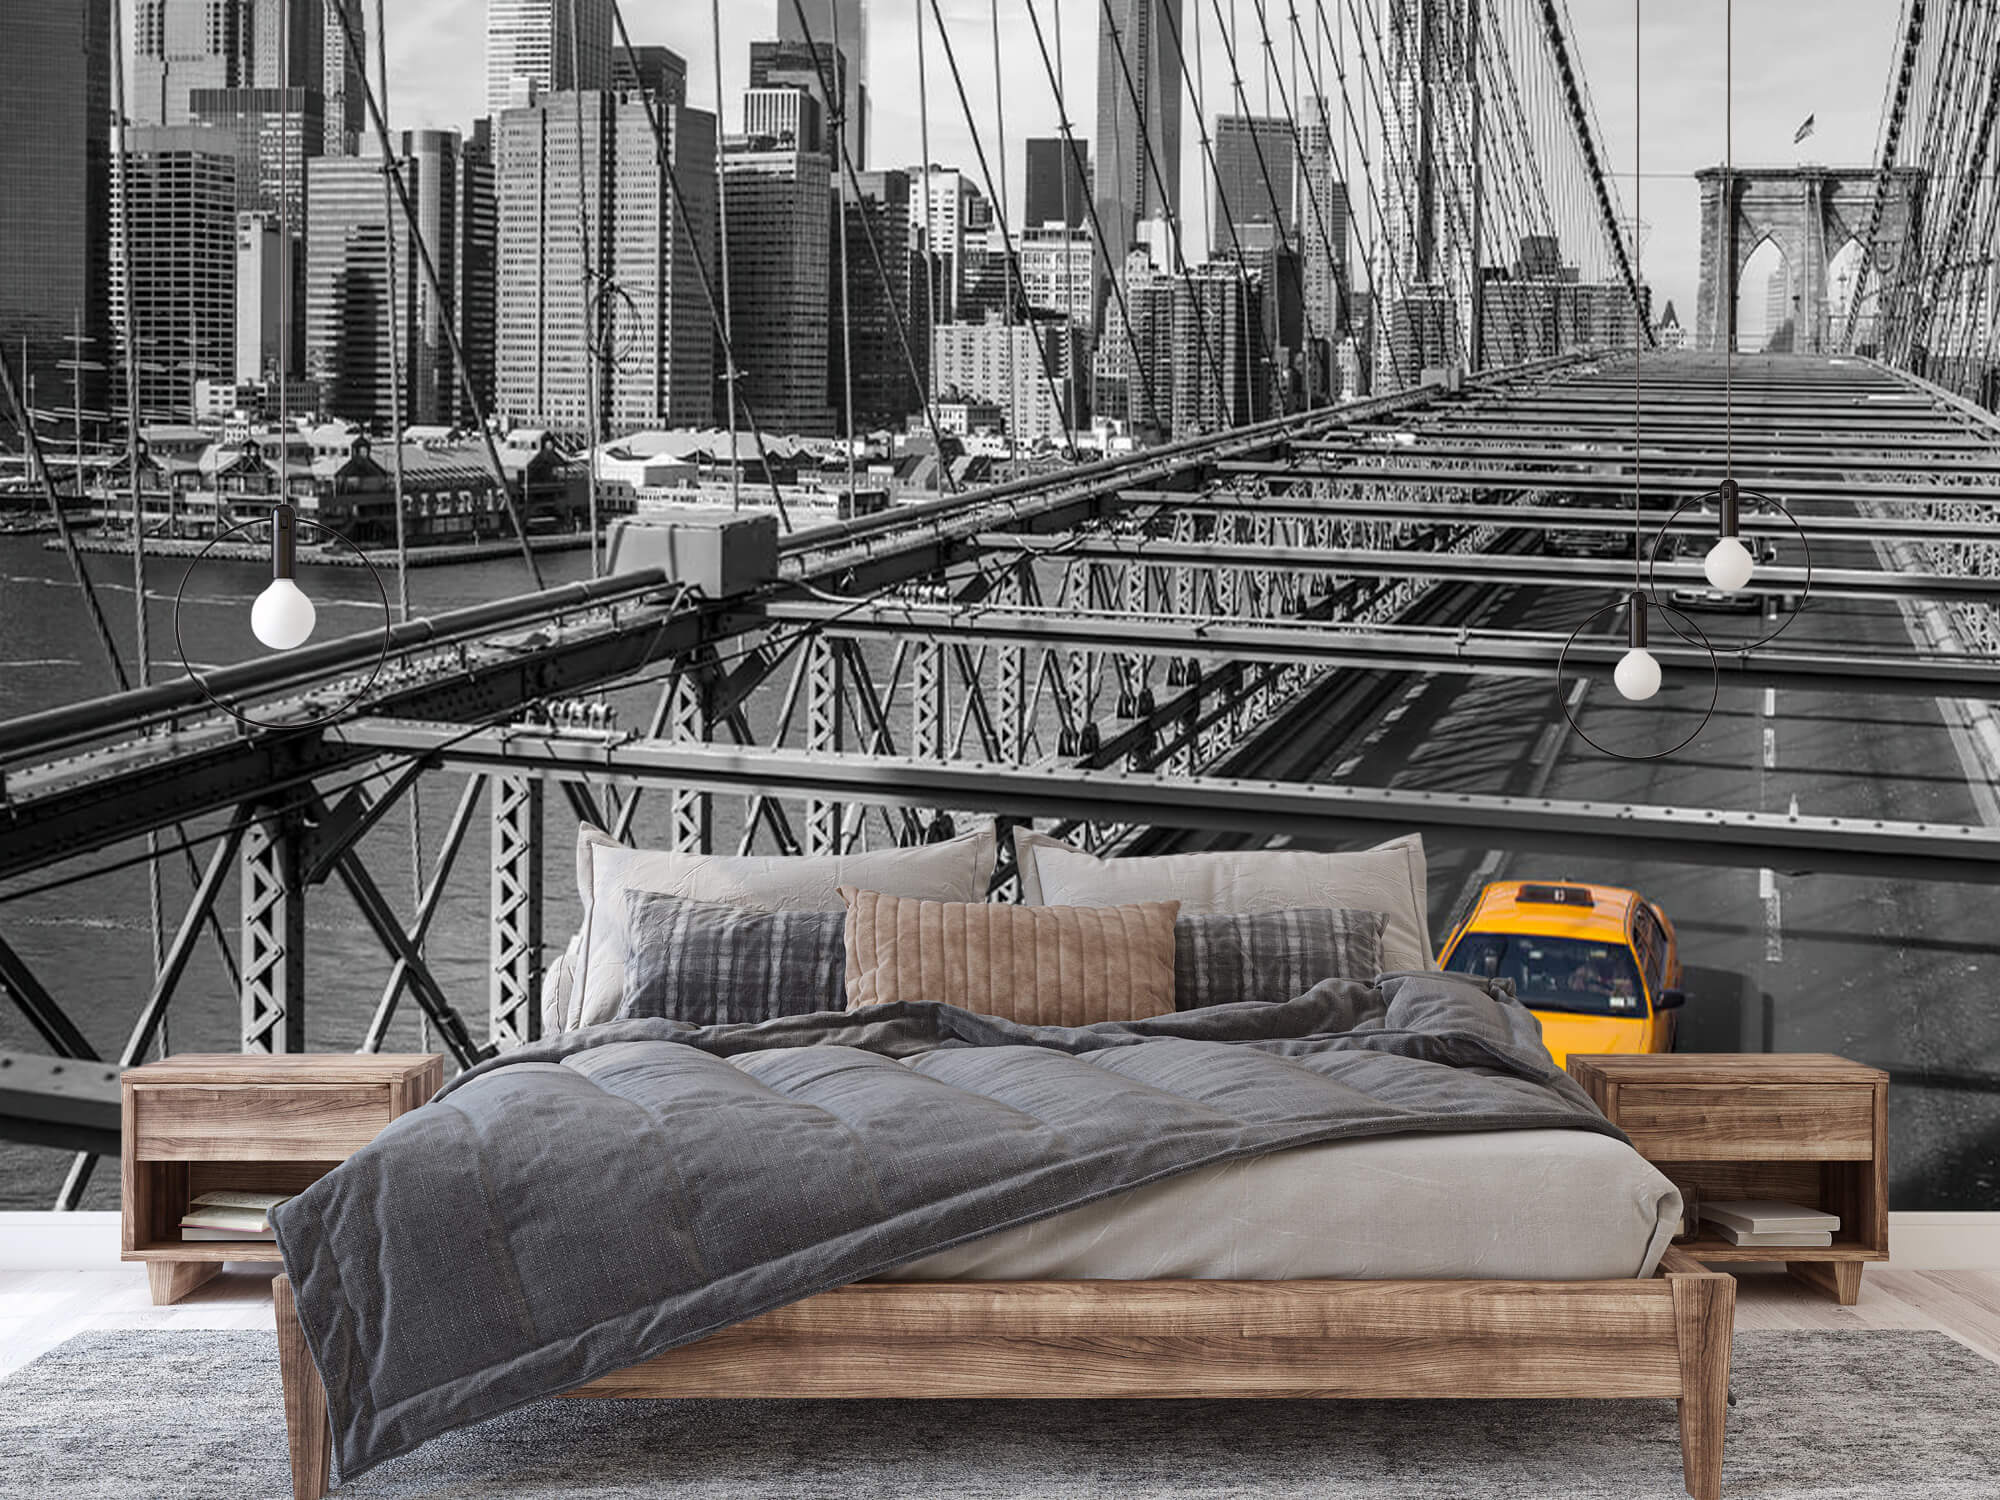 Un taxi sur le pont de Brooklyn 5